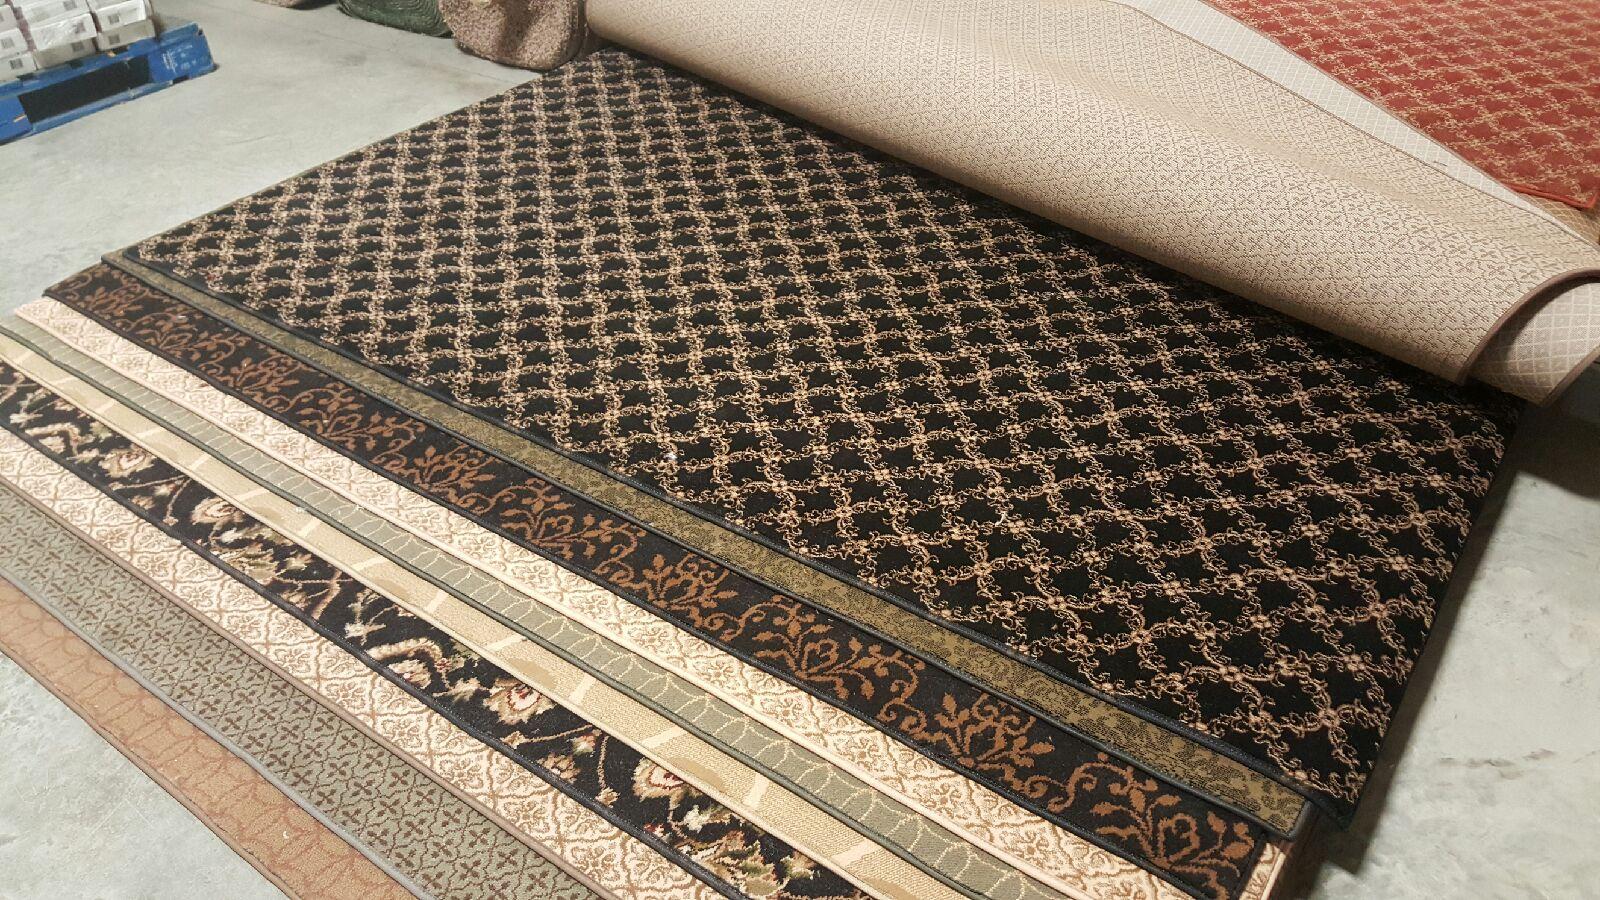 Family Carpet Fairmont Family Carpet One